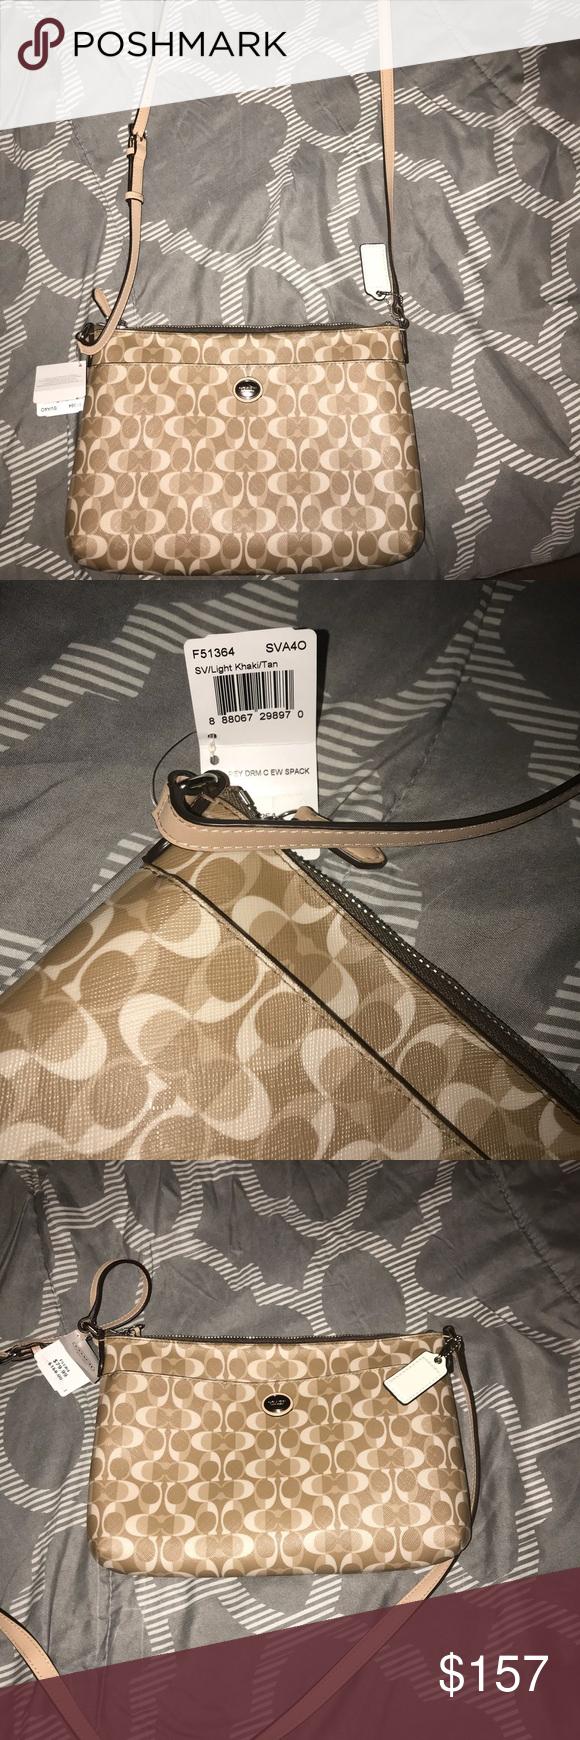 Coach crossbody nwt my posh picks pinterest designer handbags